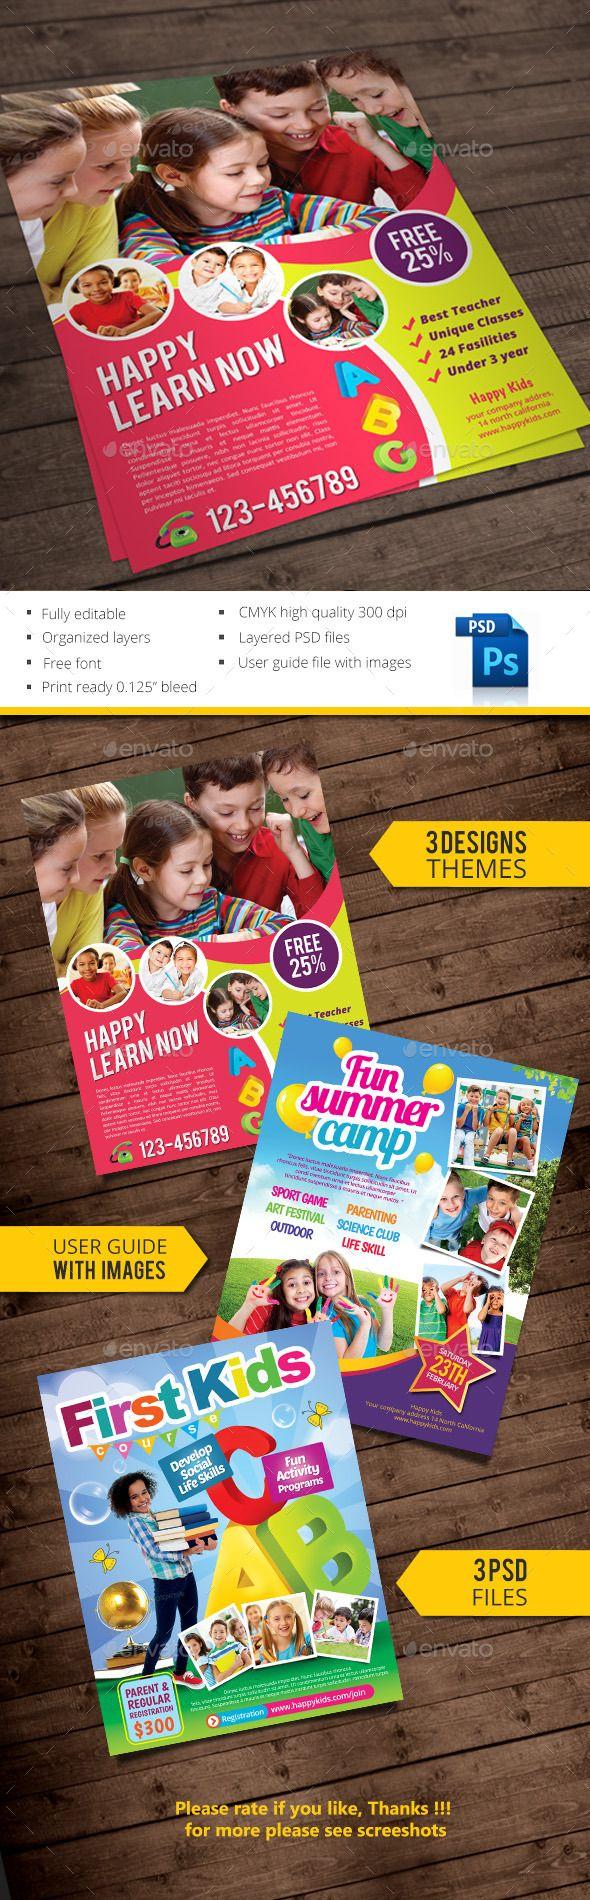 Kids, children, education, festival, flyer, game, Home Schooling, kids, kindergarten, outdoor, play, playground, school, student, teacher